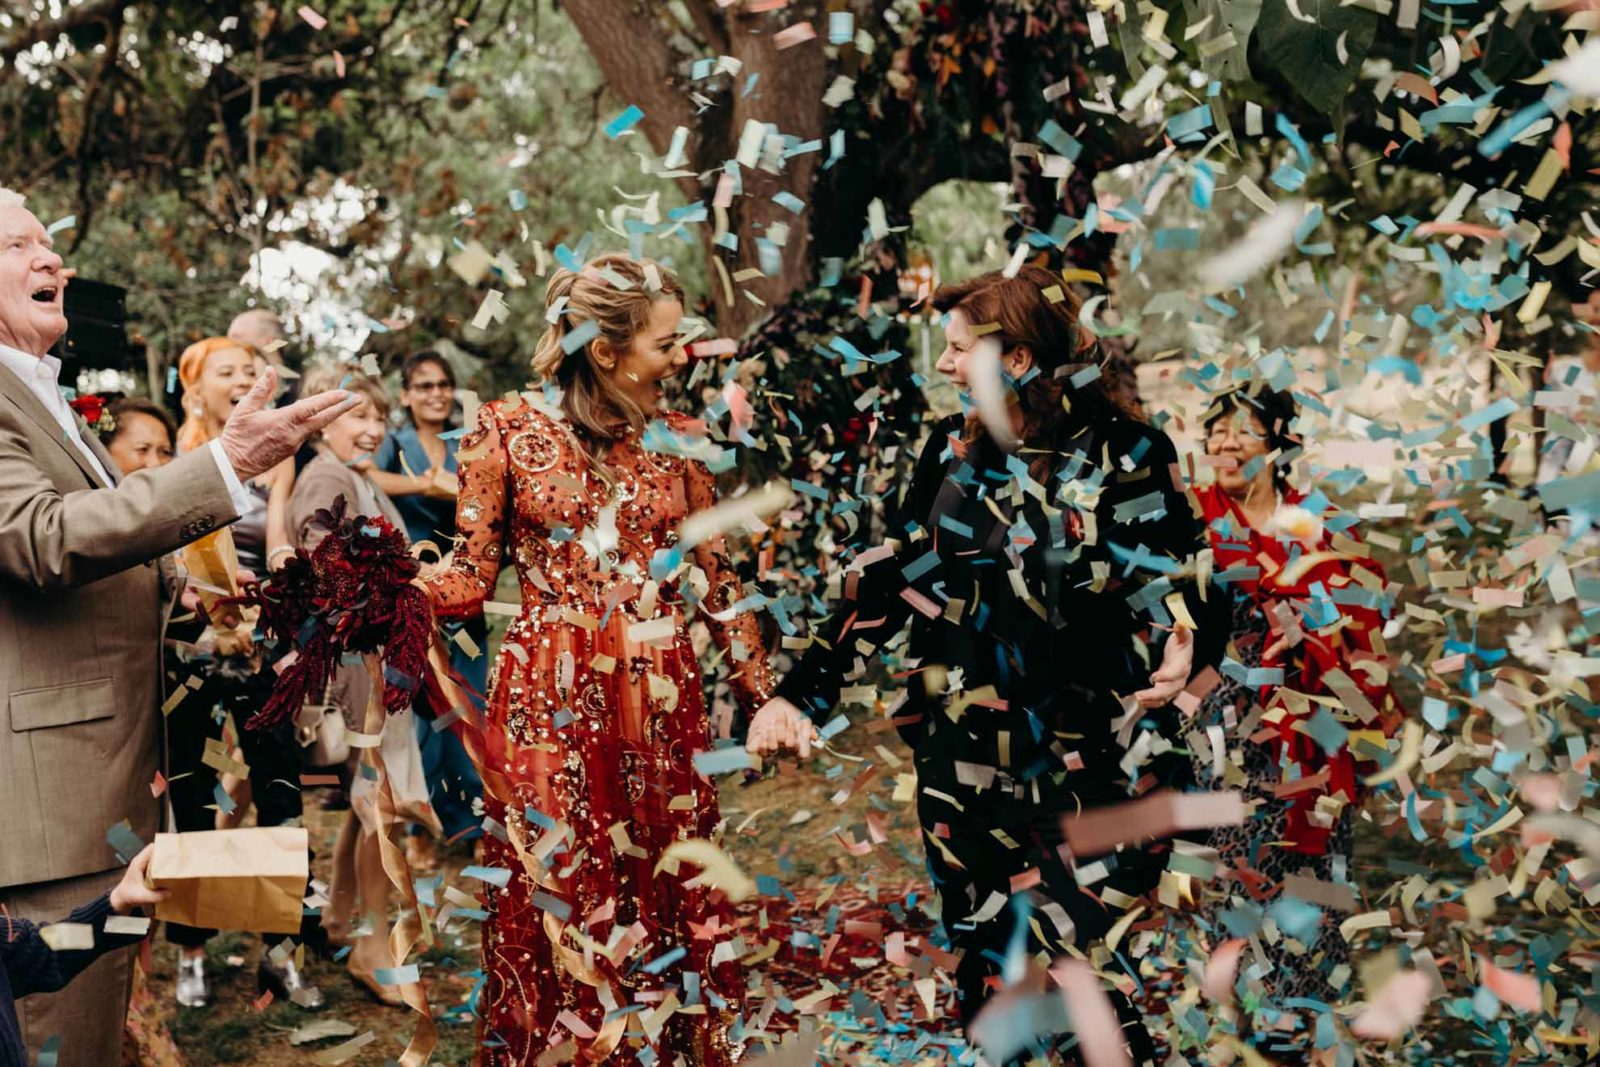 Tahnee Jade Photography lesbian lgbtqia+ gay wedding elopment engagement photographer Melbourne Victoria Dancing With Her directory 2